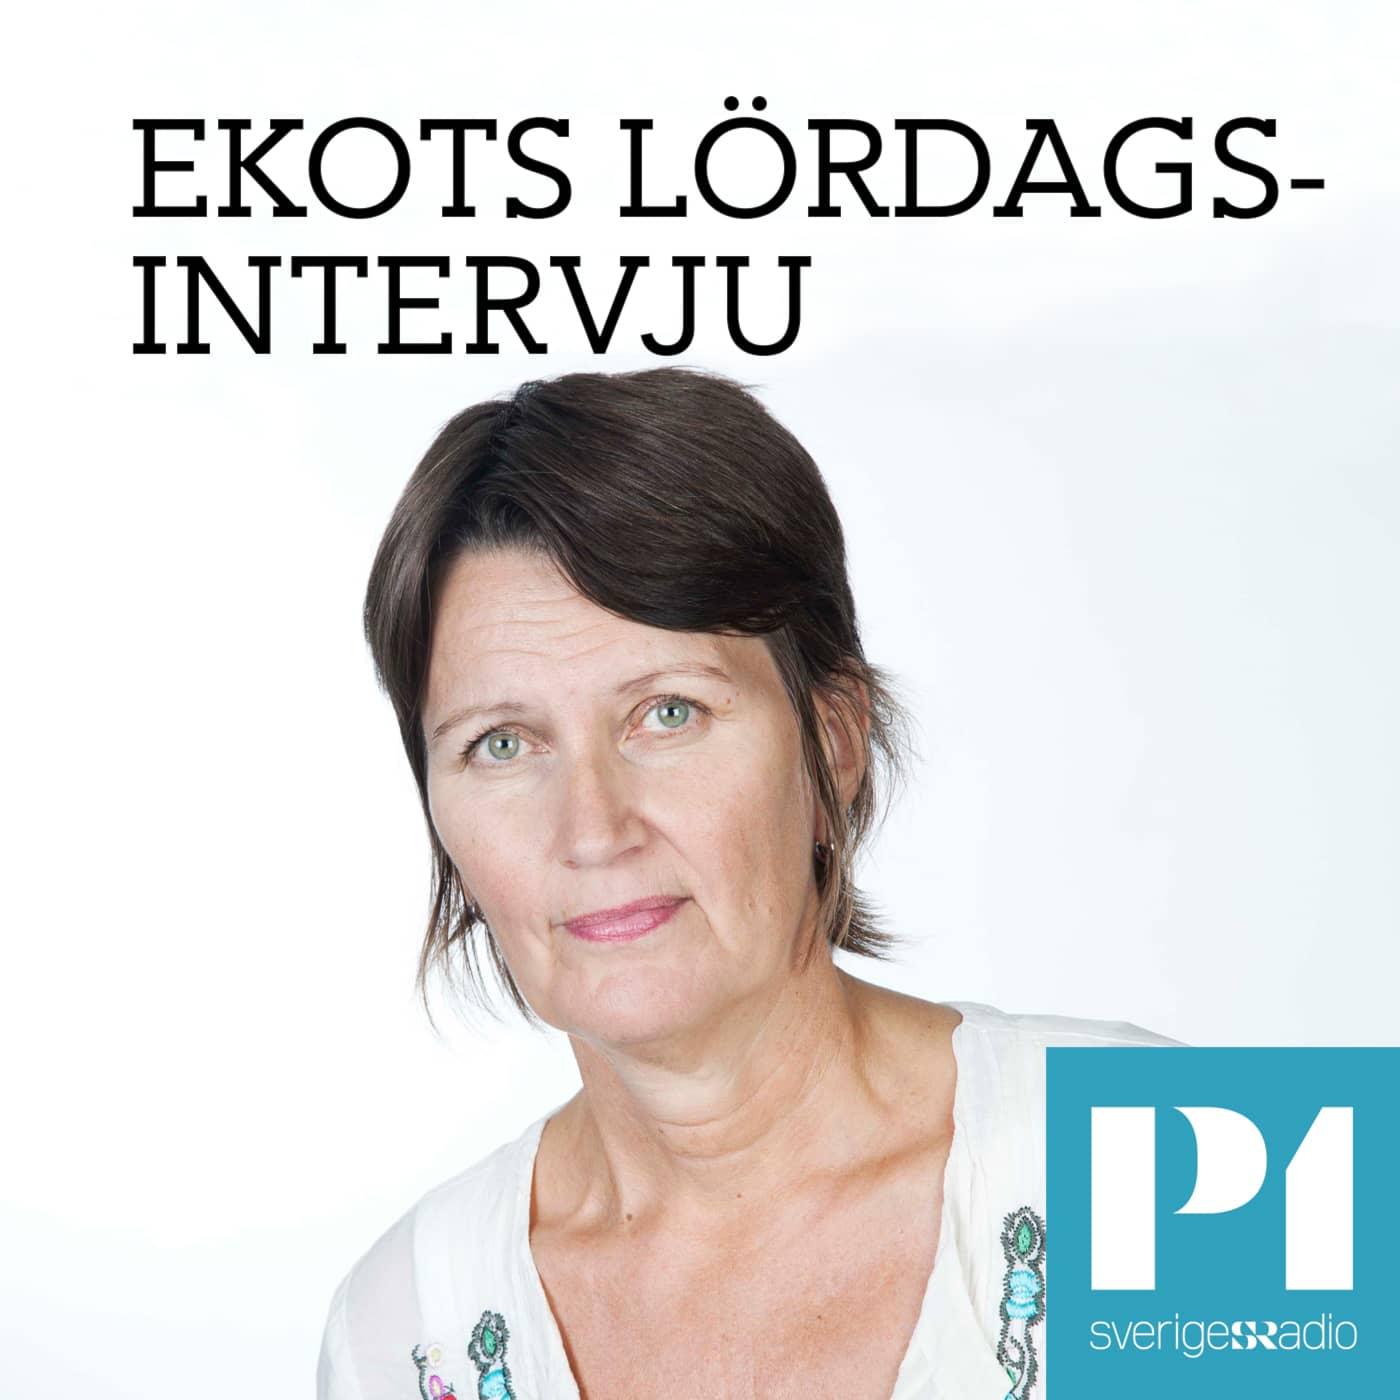 Ekots lördagsintervju i P1